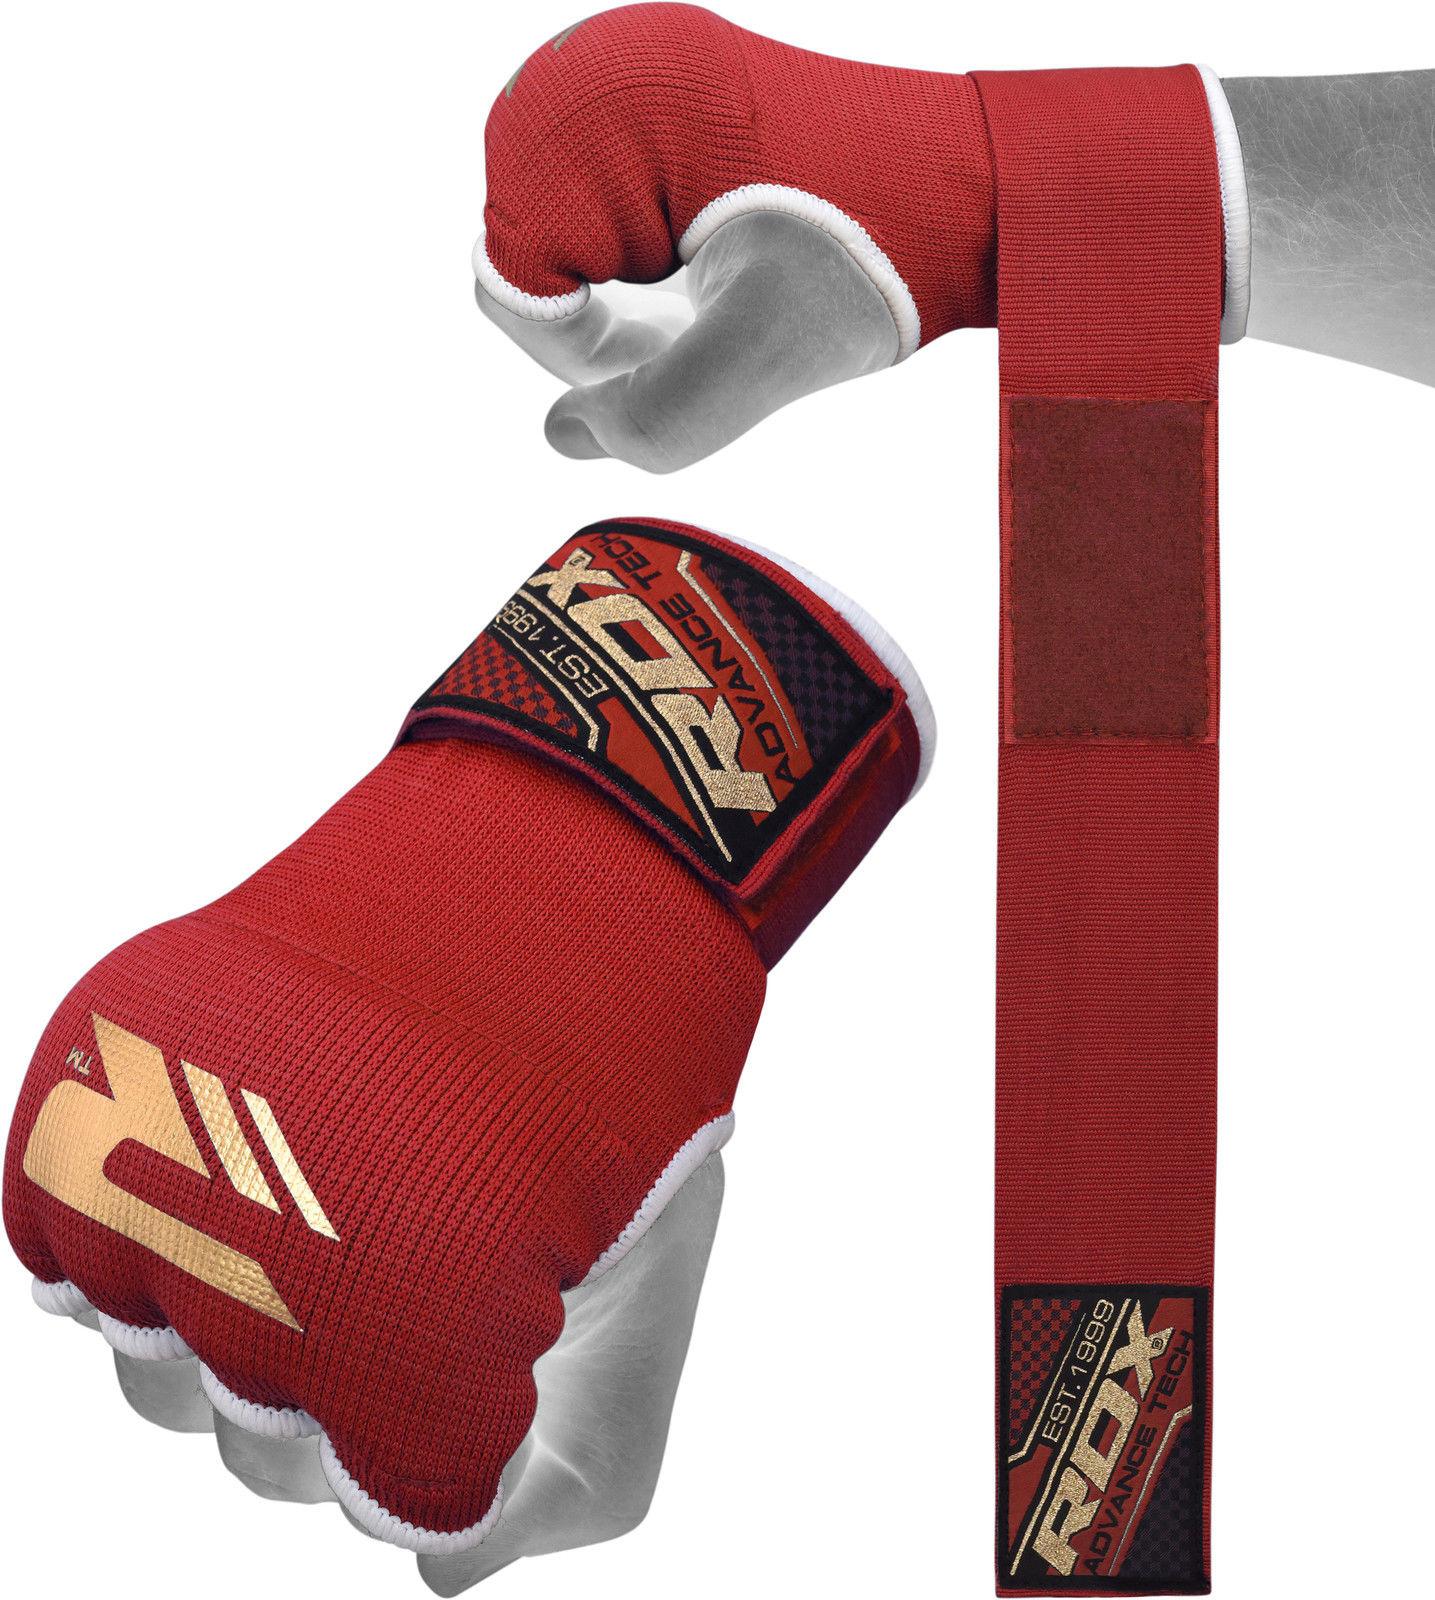 RDX Sports Binnenhandschoenen met padding - Rood-0